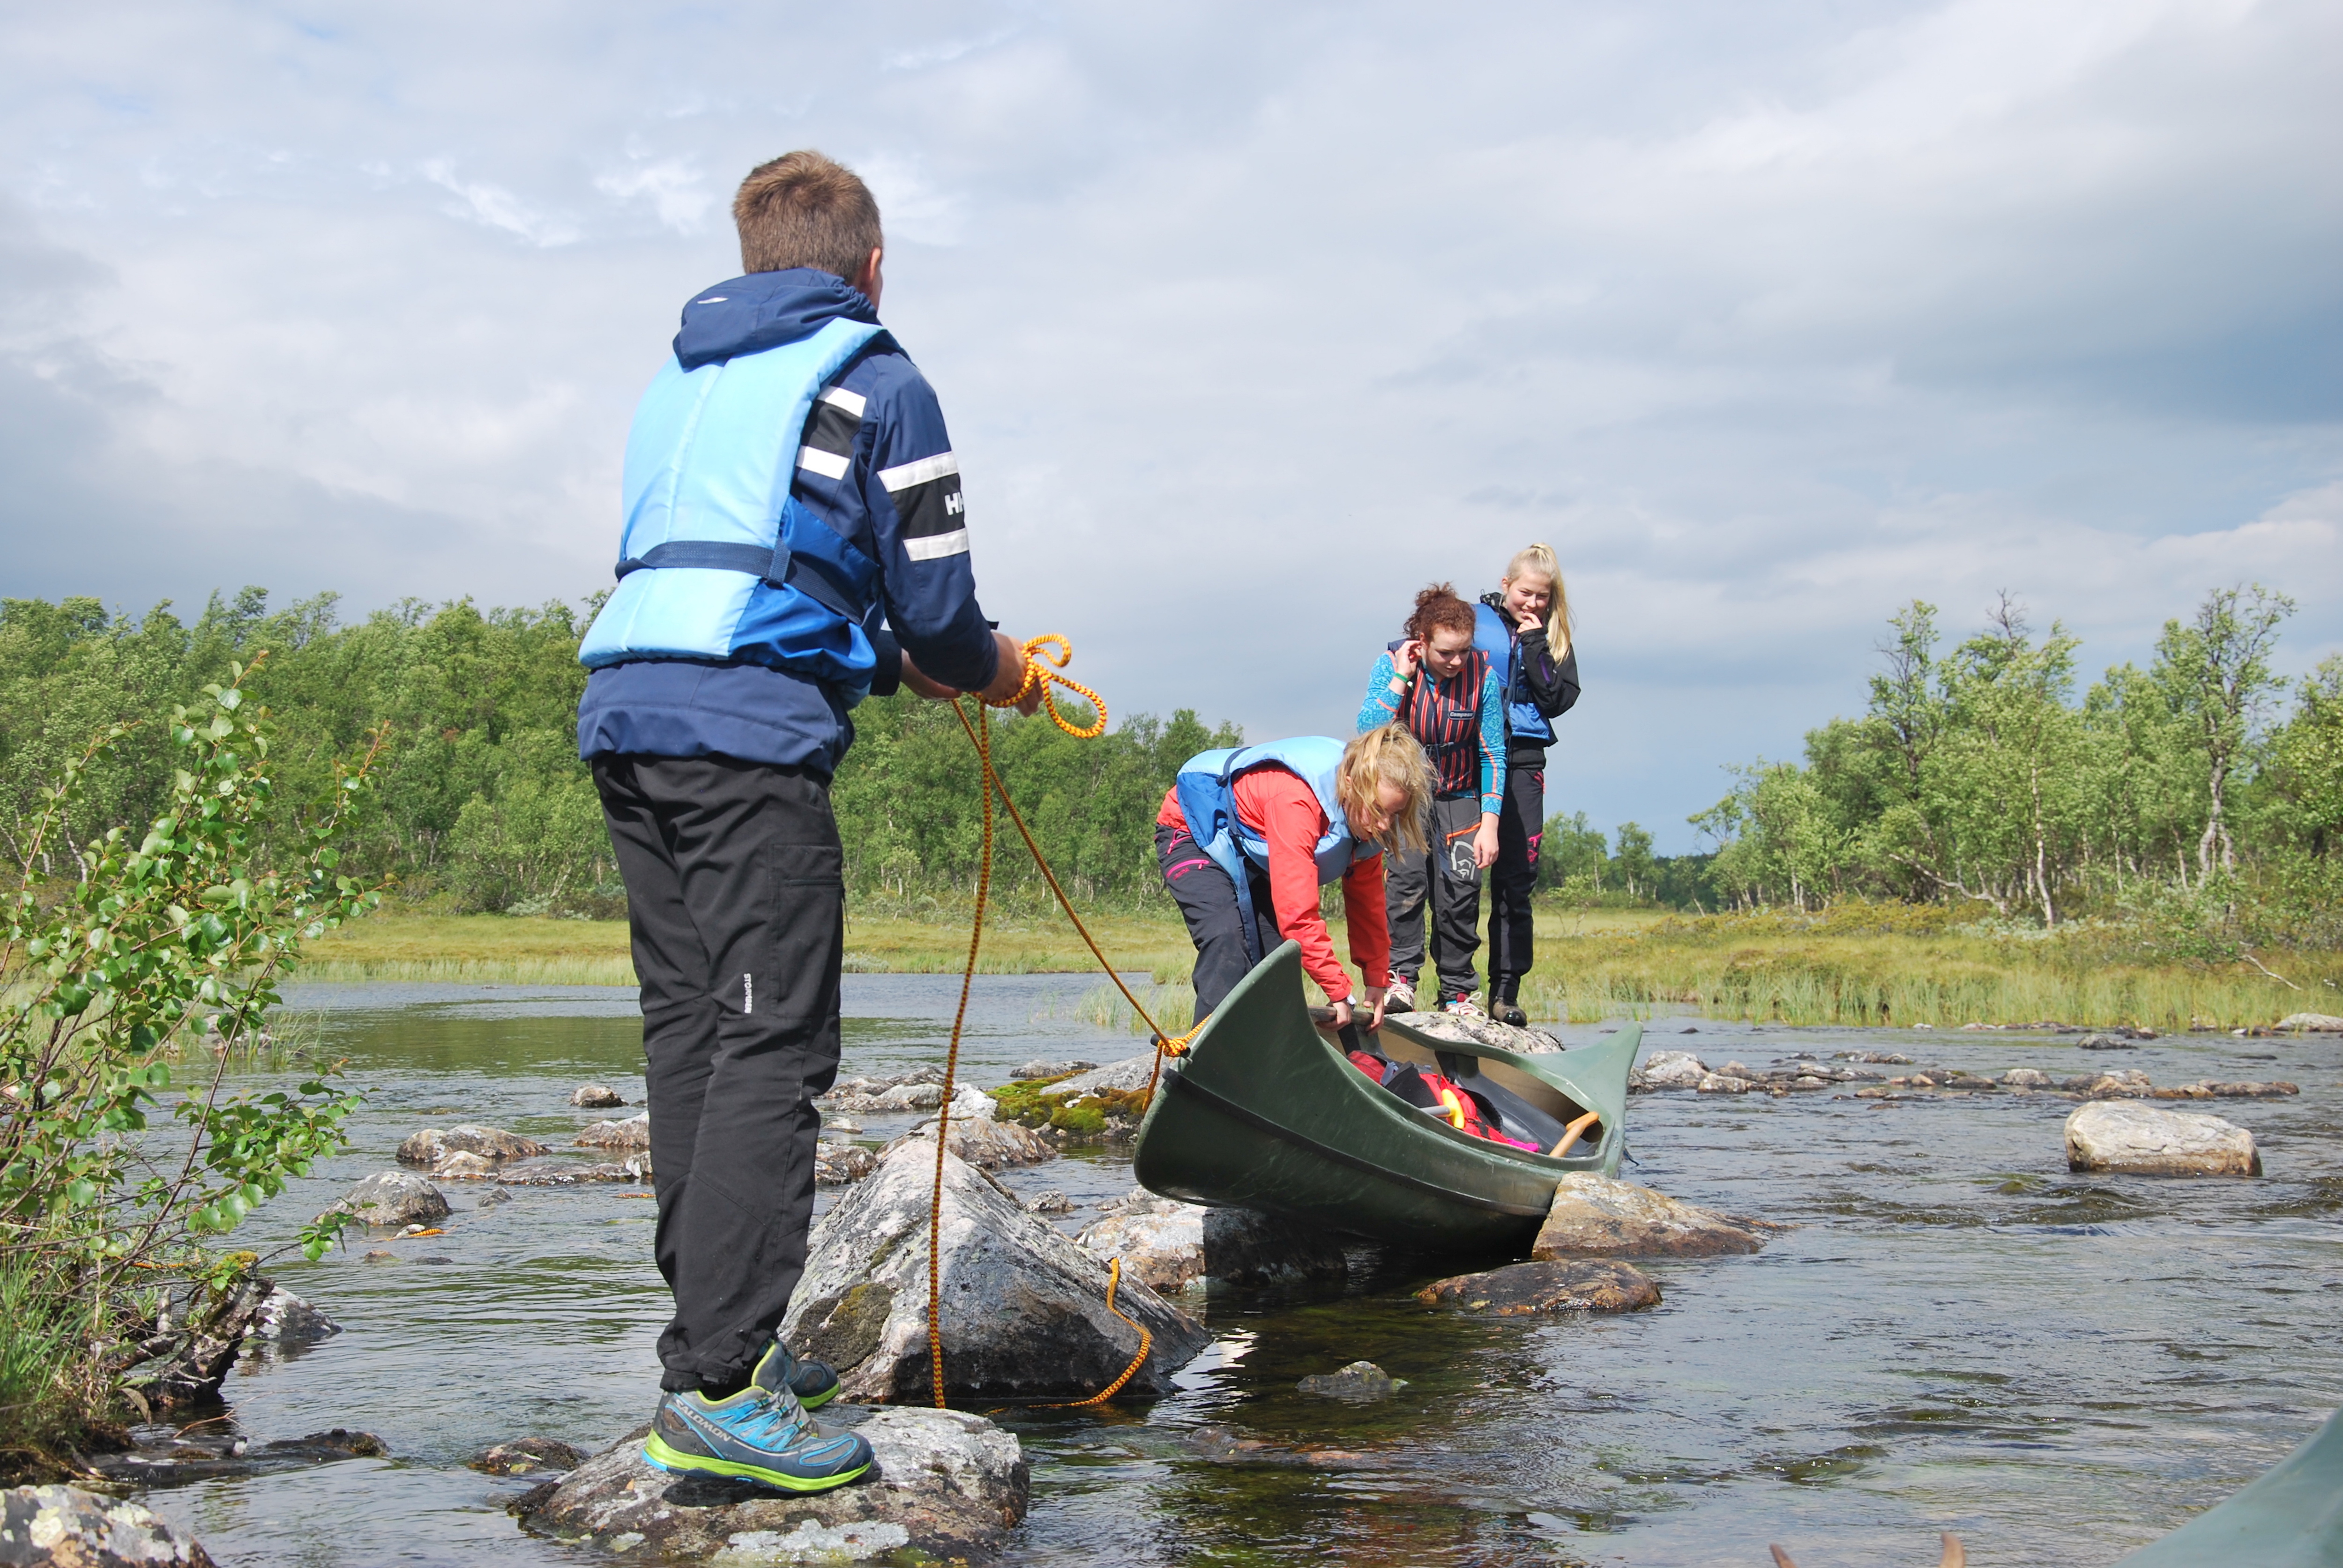 Ungdommer på kanotur. Foto: Fjelldriv. CC-BY-SA